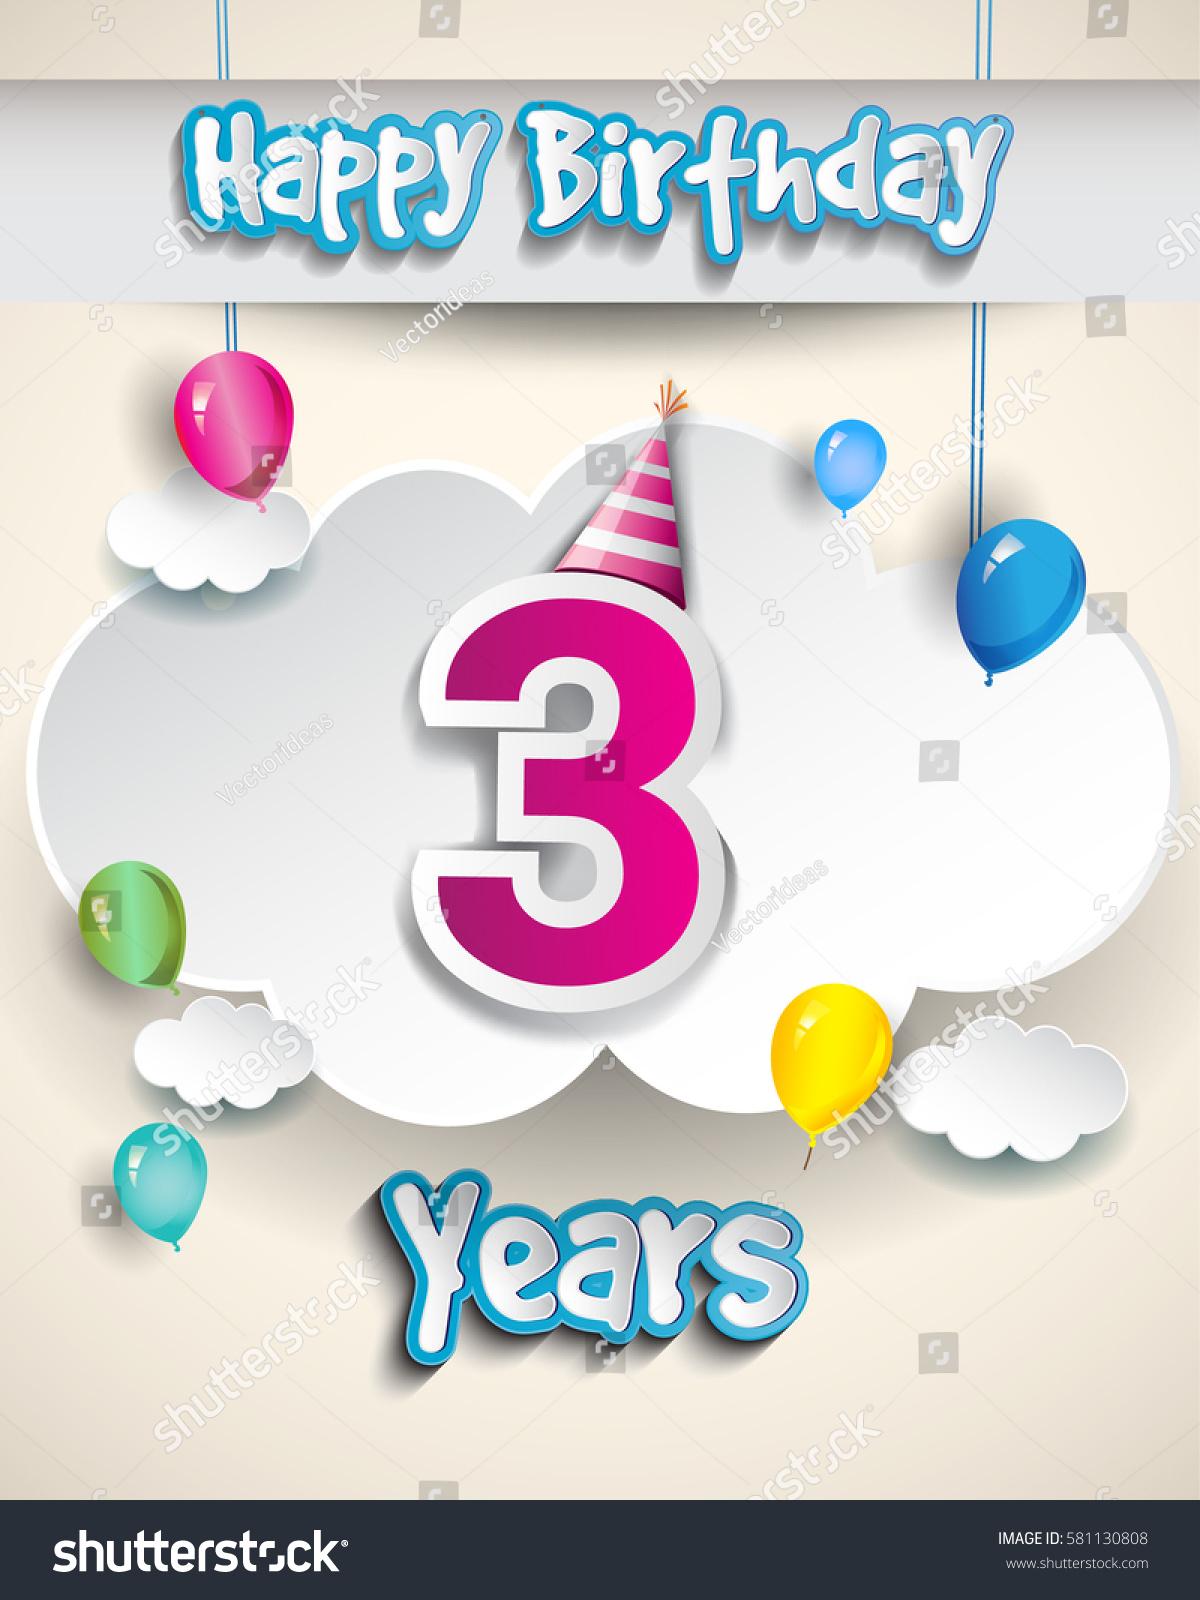 3rd Birthday Celebration Design Clouds Balloons Stock Vector ...